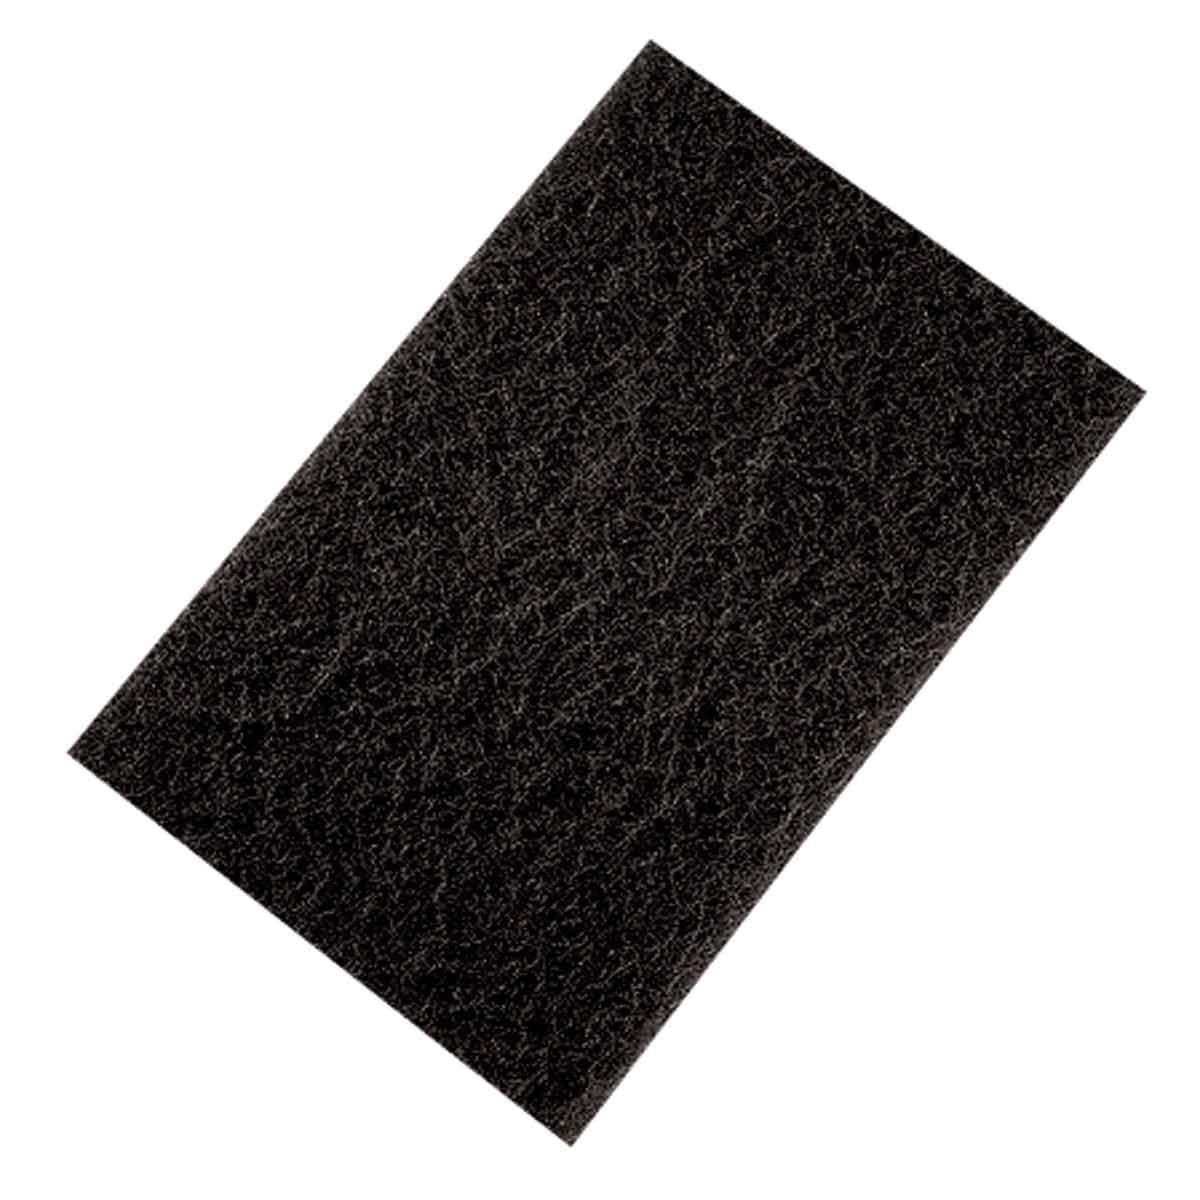 ULTP69BLK Pearl Abrasive